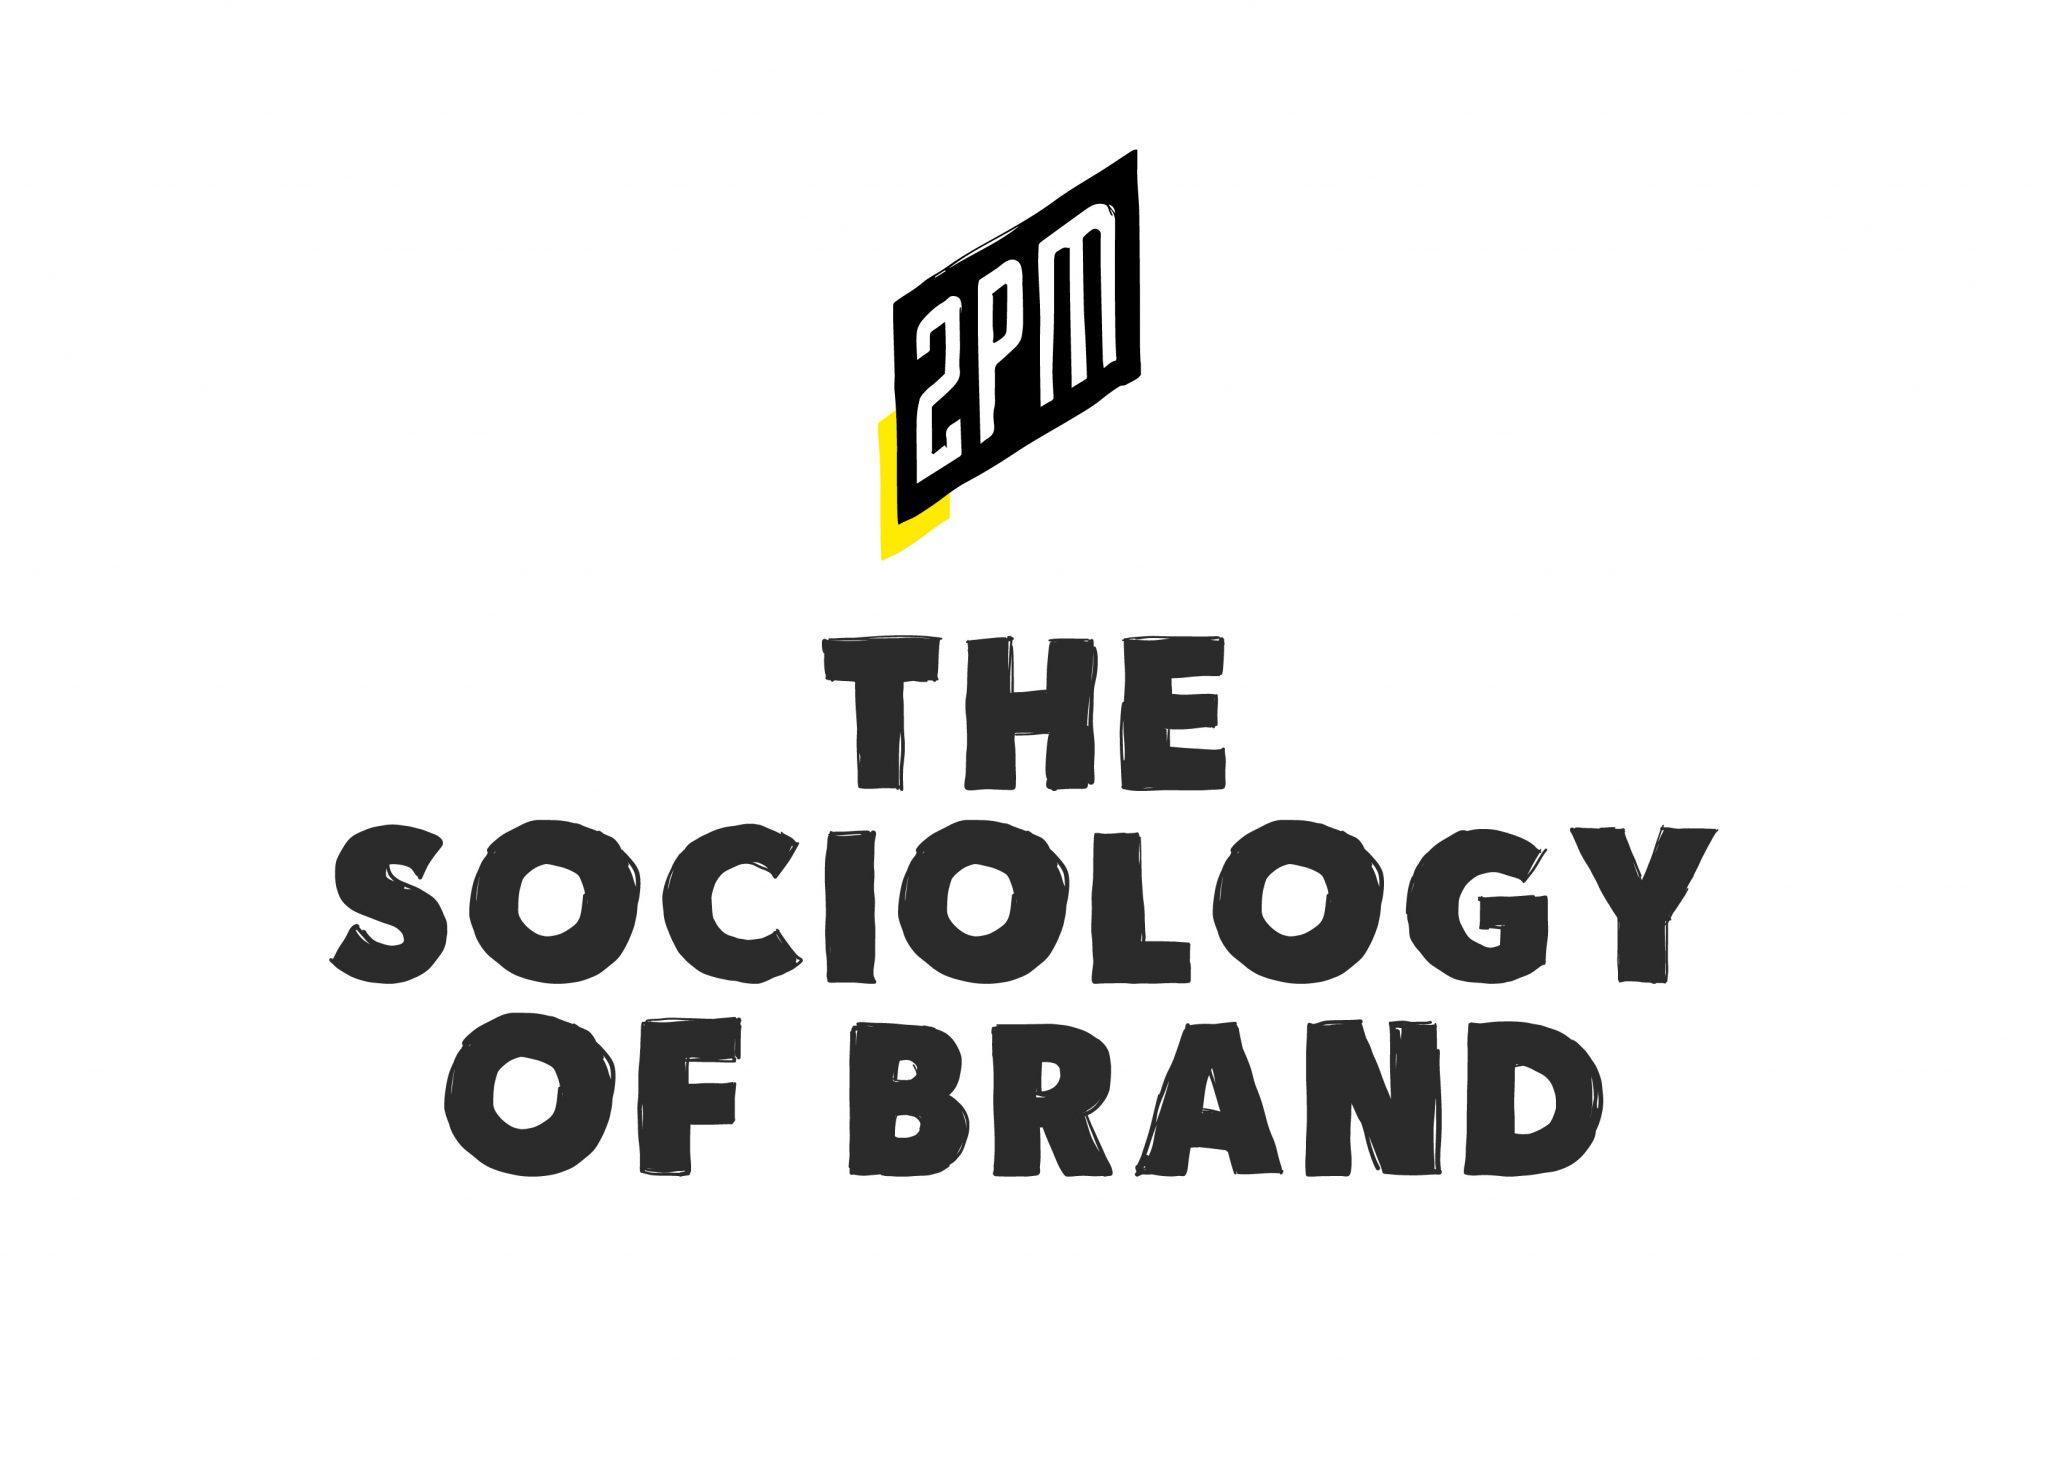 sociologyofbrand.jpg